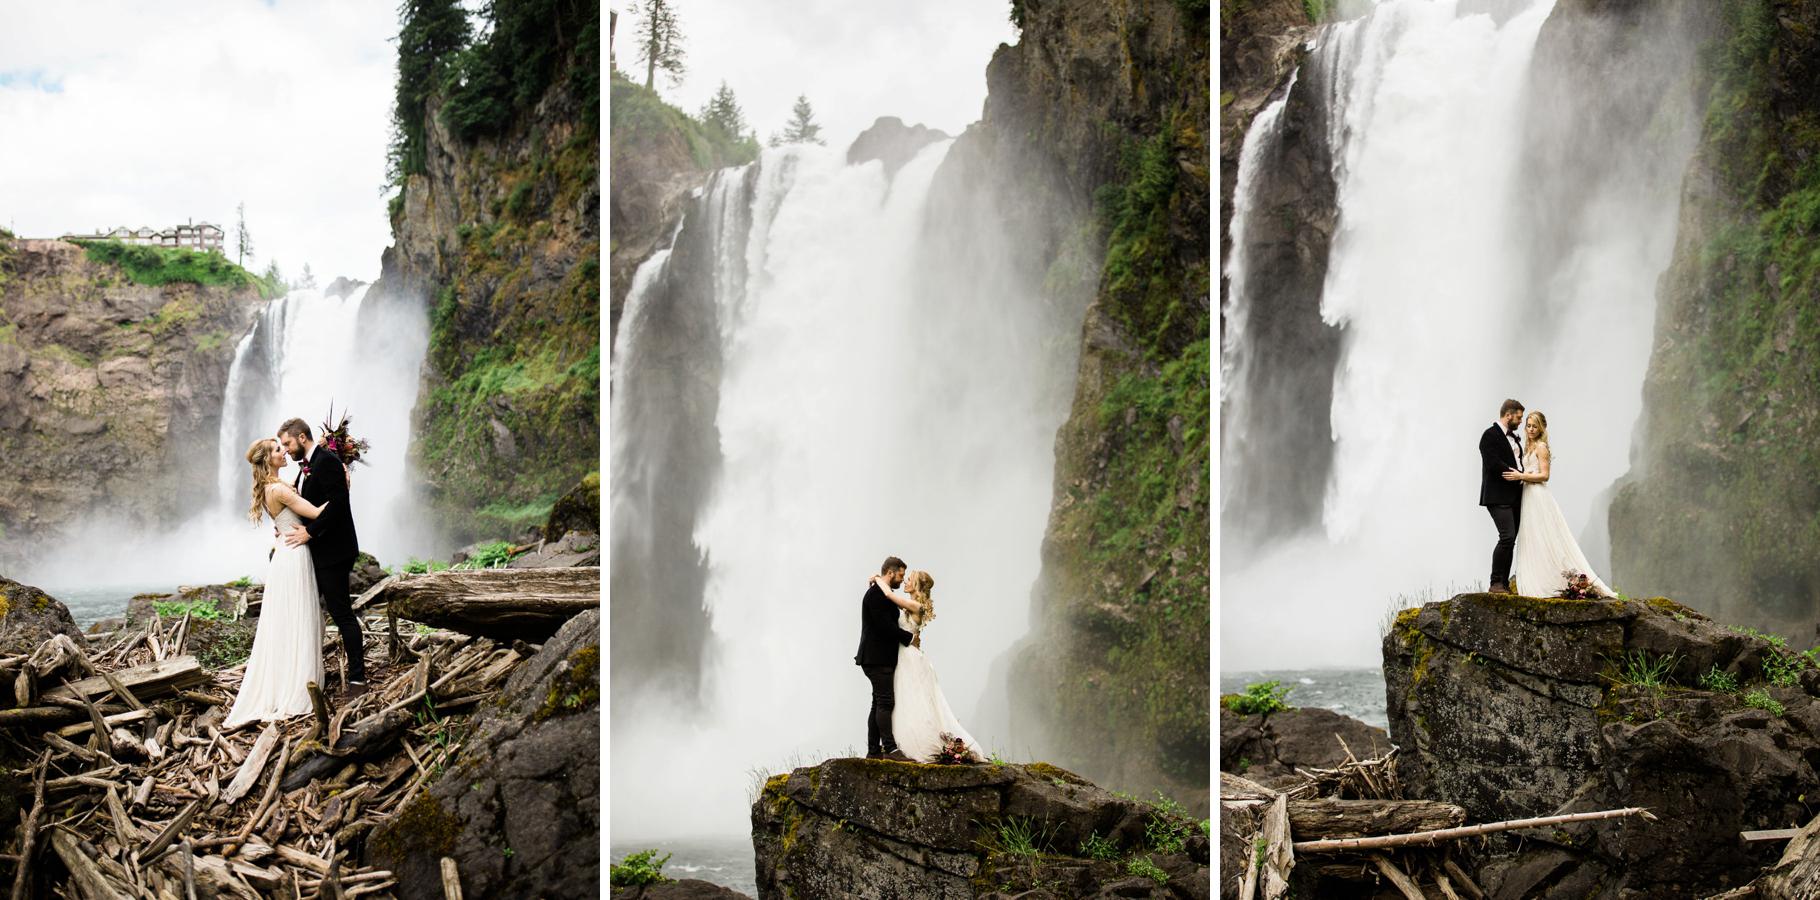 22-Adventure-Elopement-Waterfall-Seattle-Wedding-Photographer-Snoqualmie-Falls-Hike